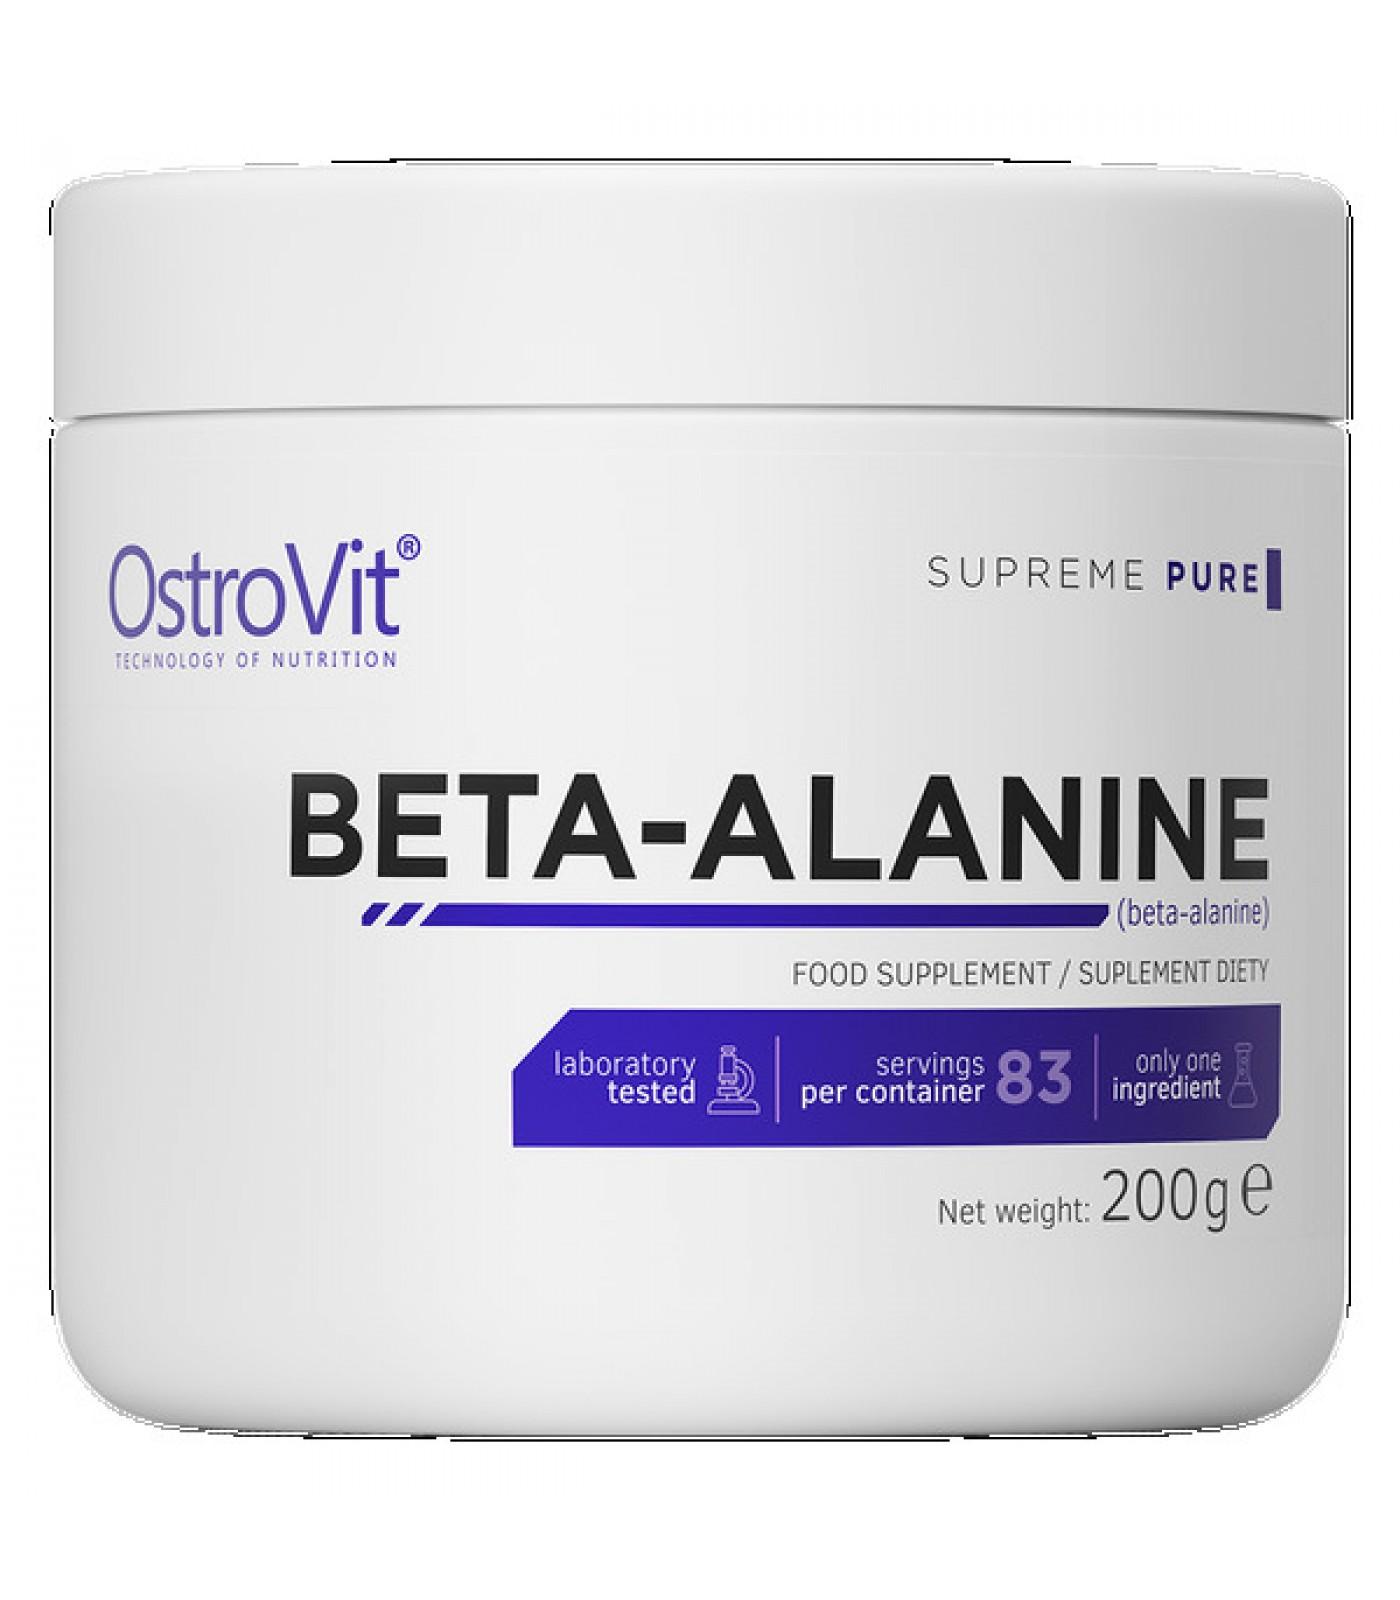 OstroVit - Beta Alanine Powder